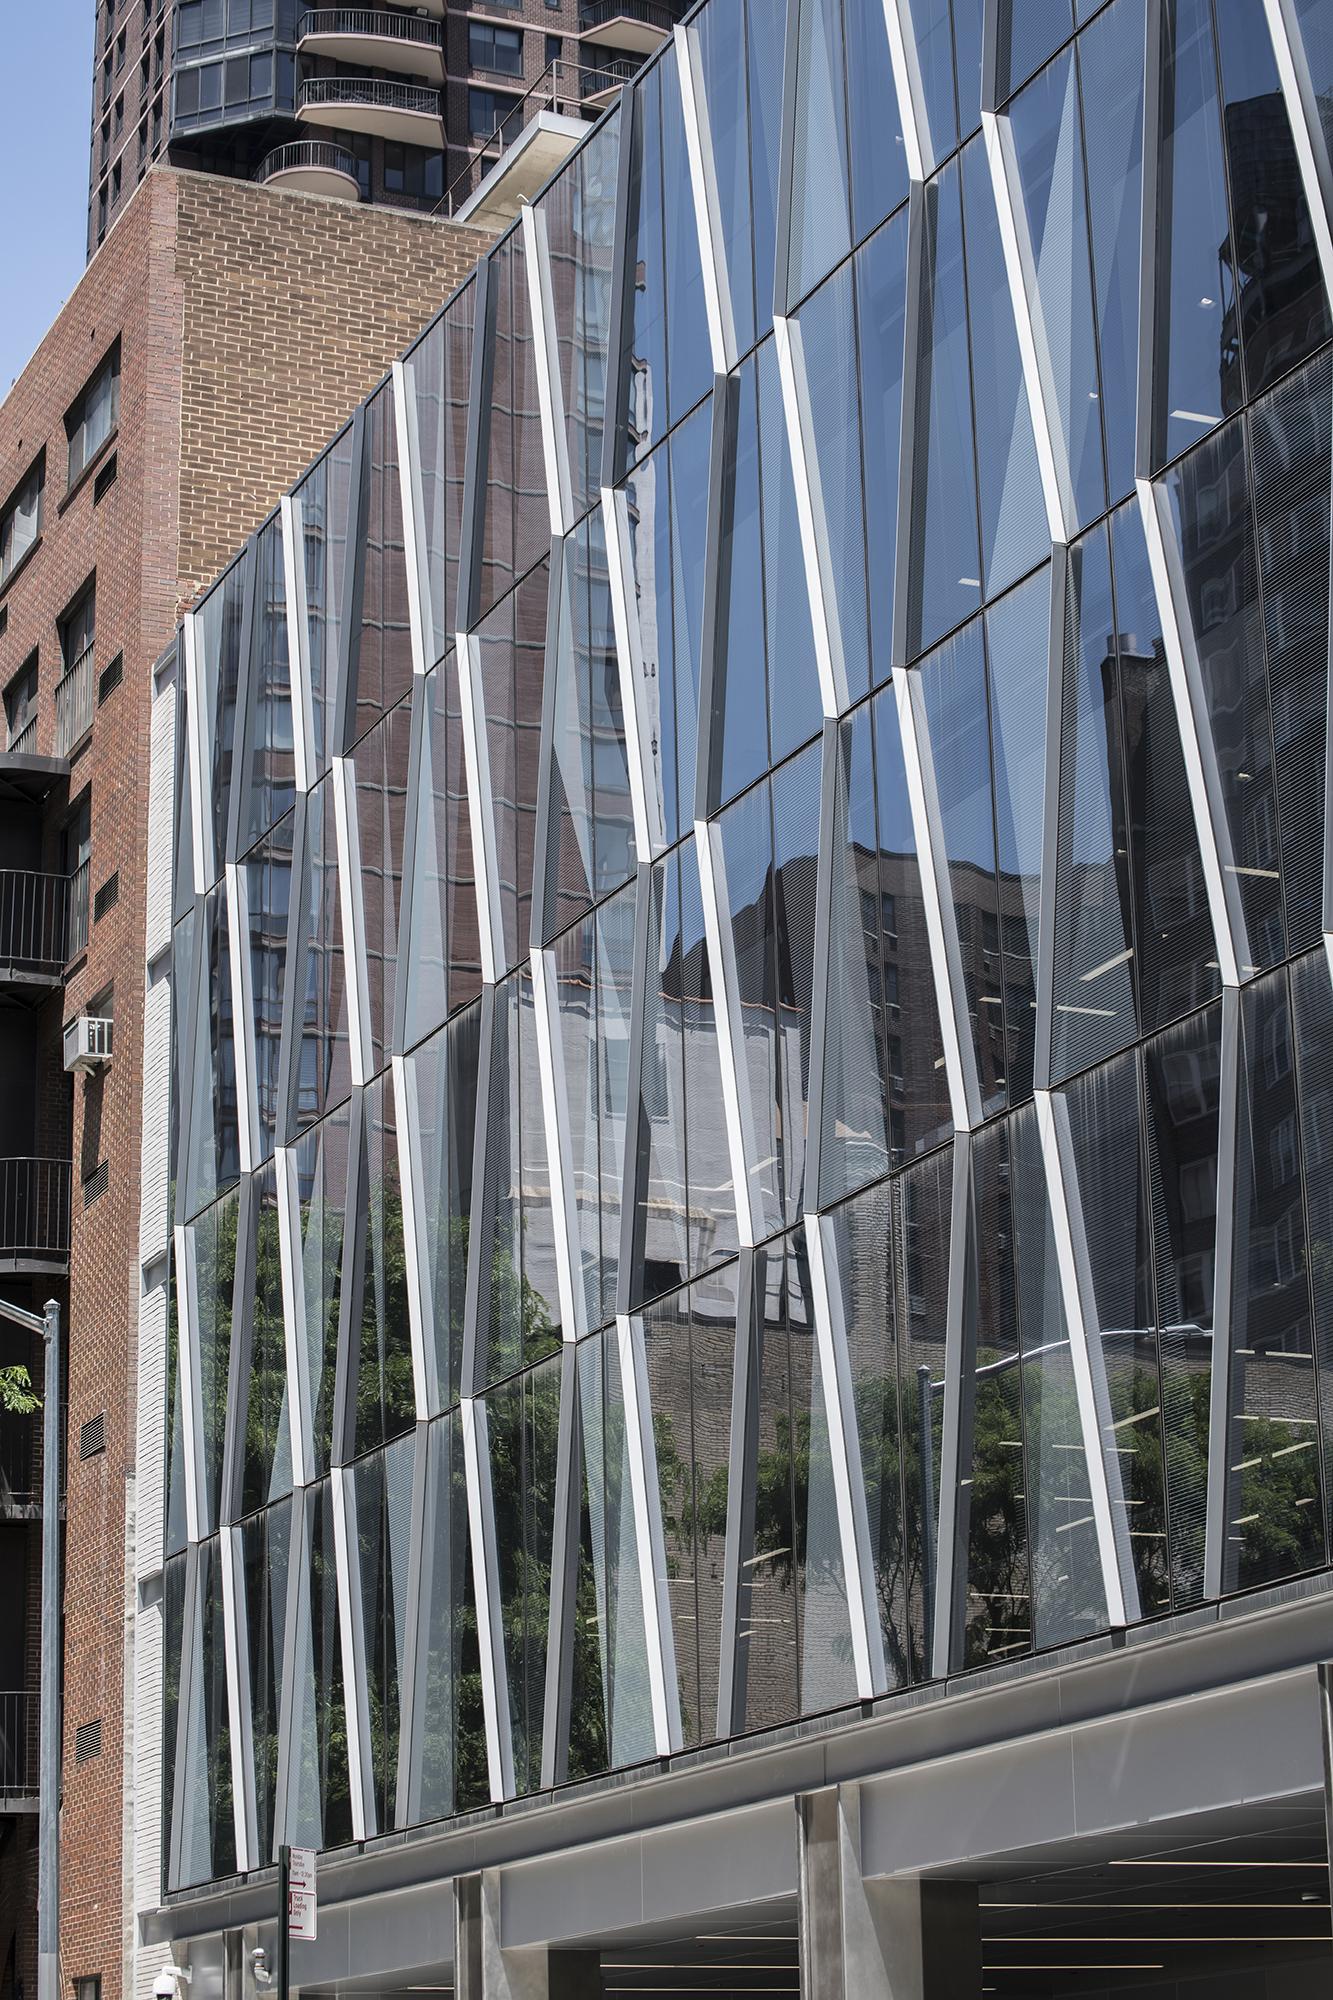 Memorial Sloane Kettering Cancer Clinic, New York